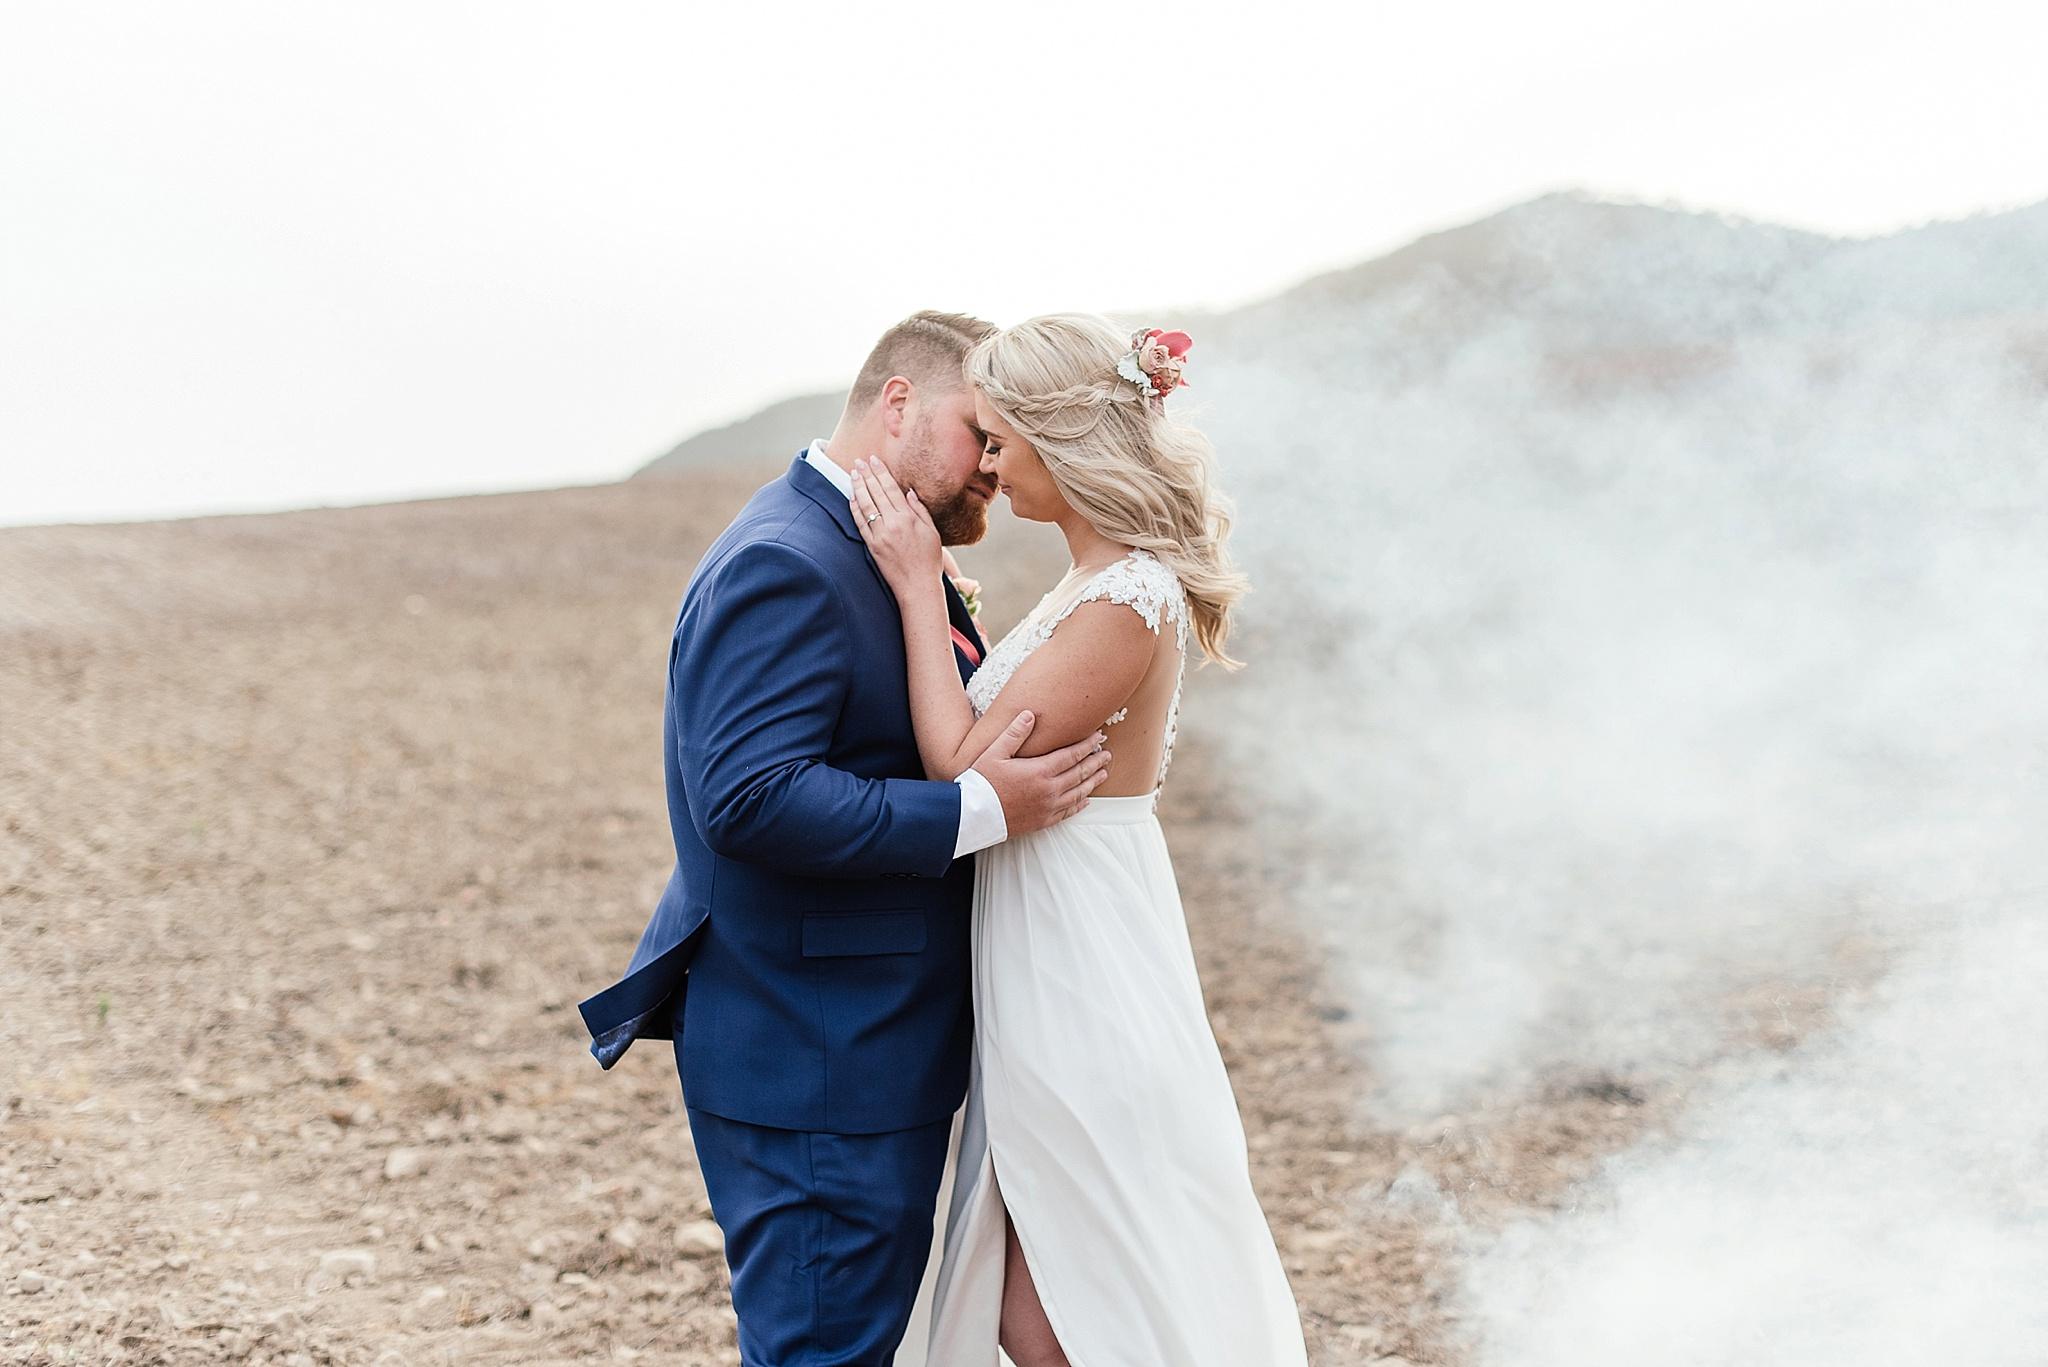 Cape Town Photographer Darren Bester - Die Woud Wedding - Gareth & Roxanne_0035.jpg